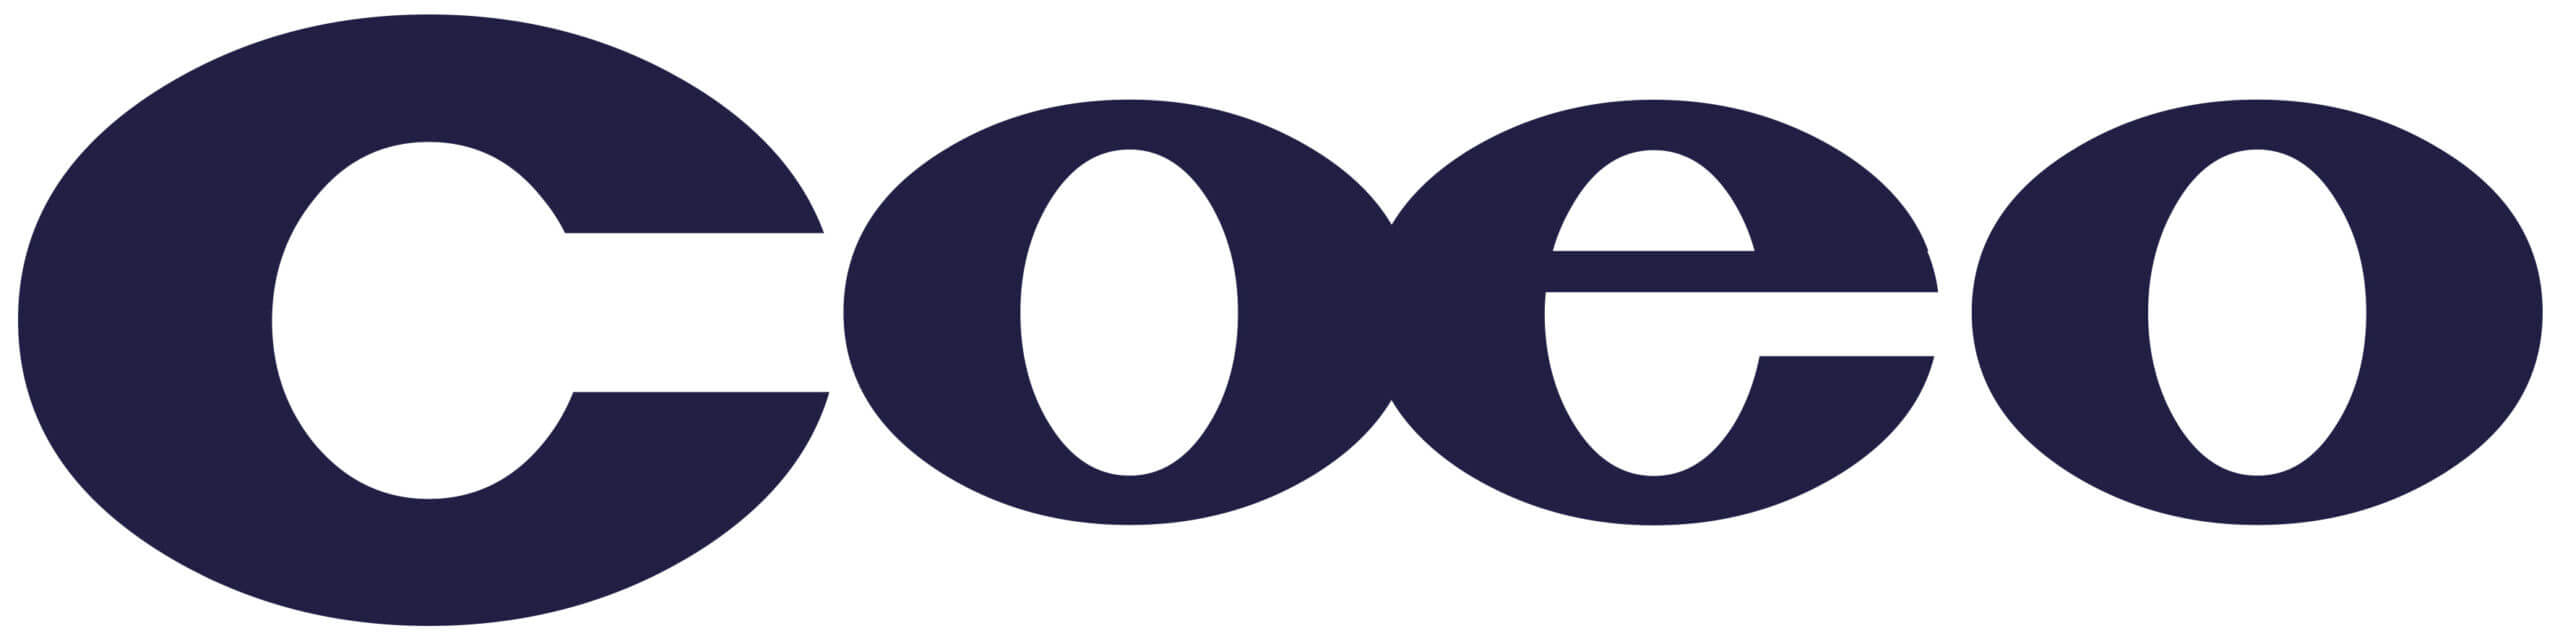 Coeo logo